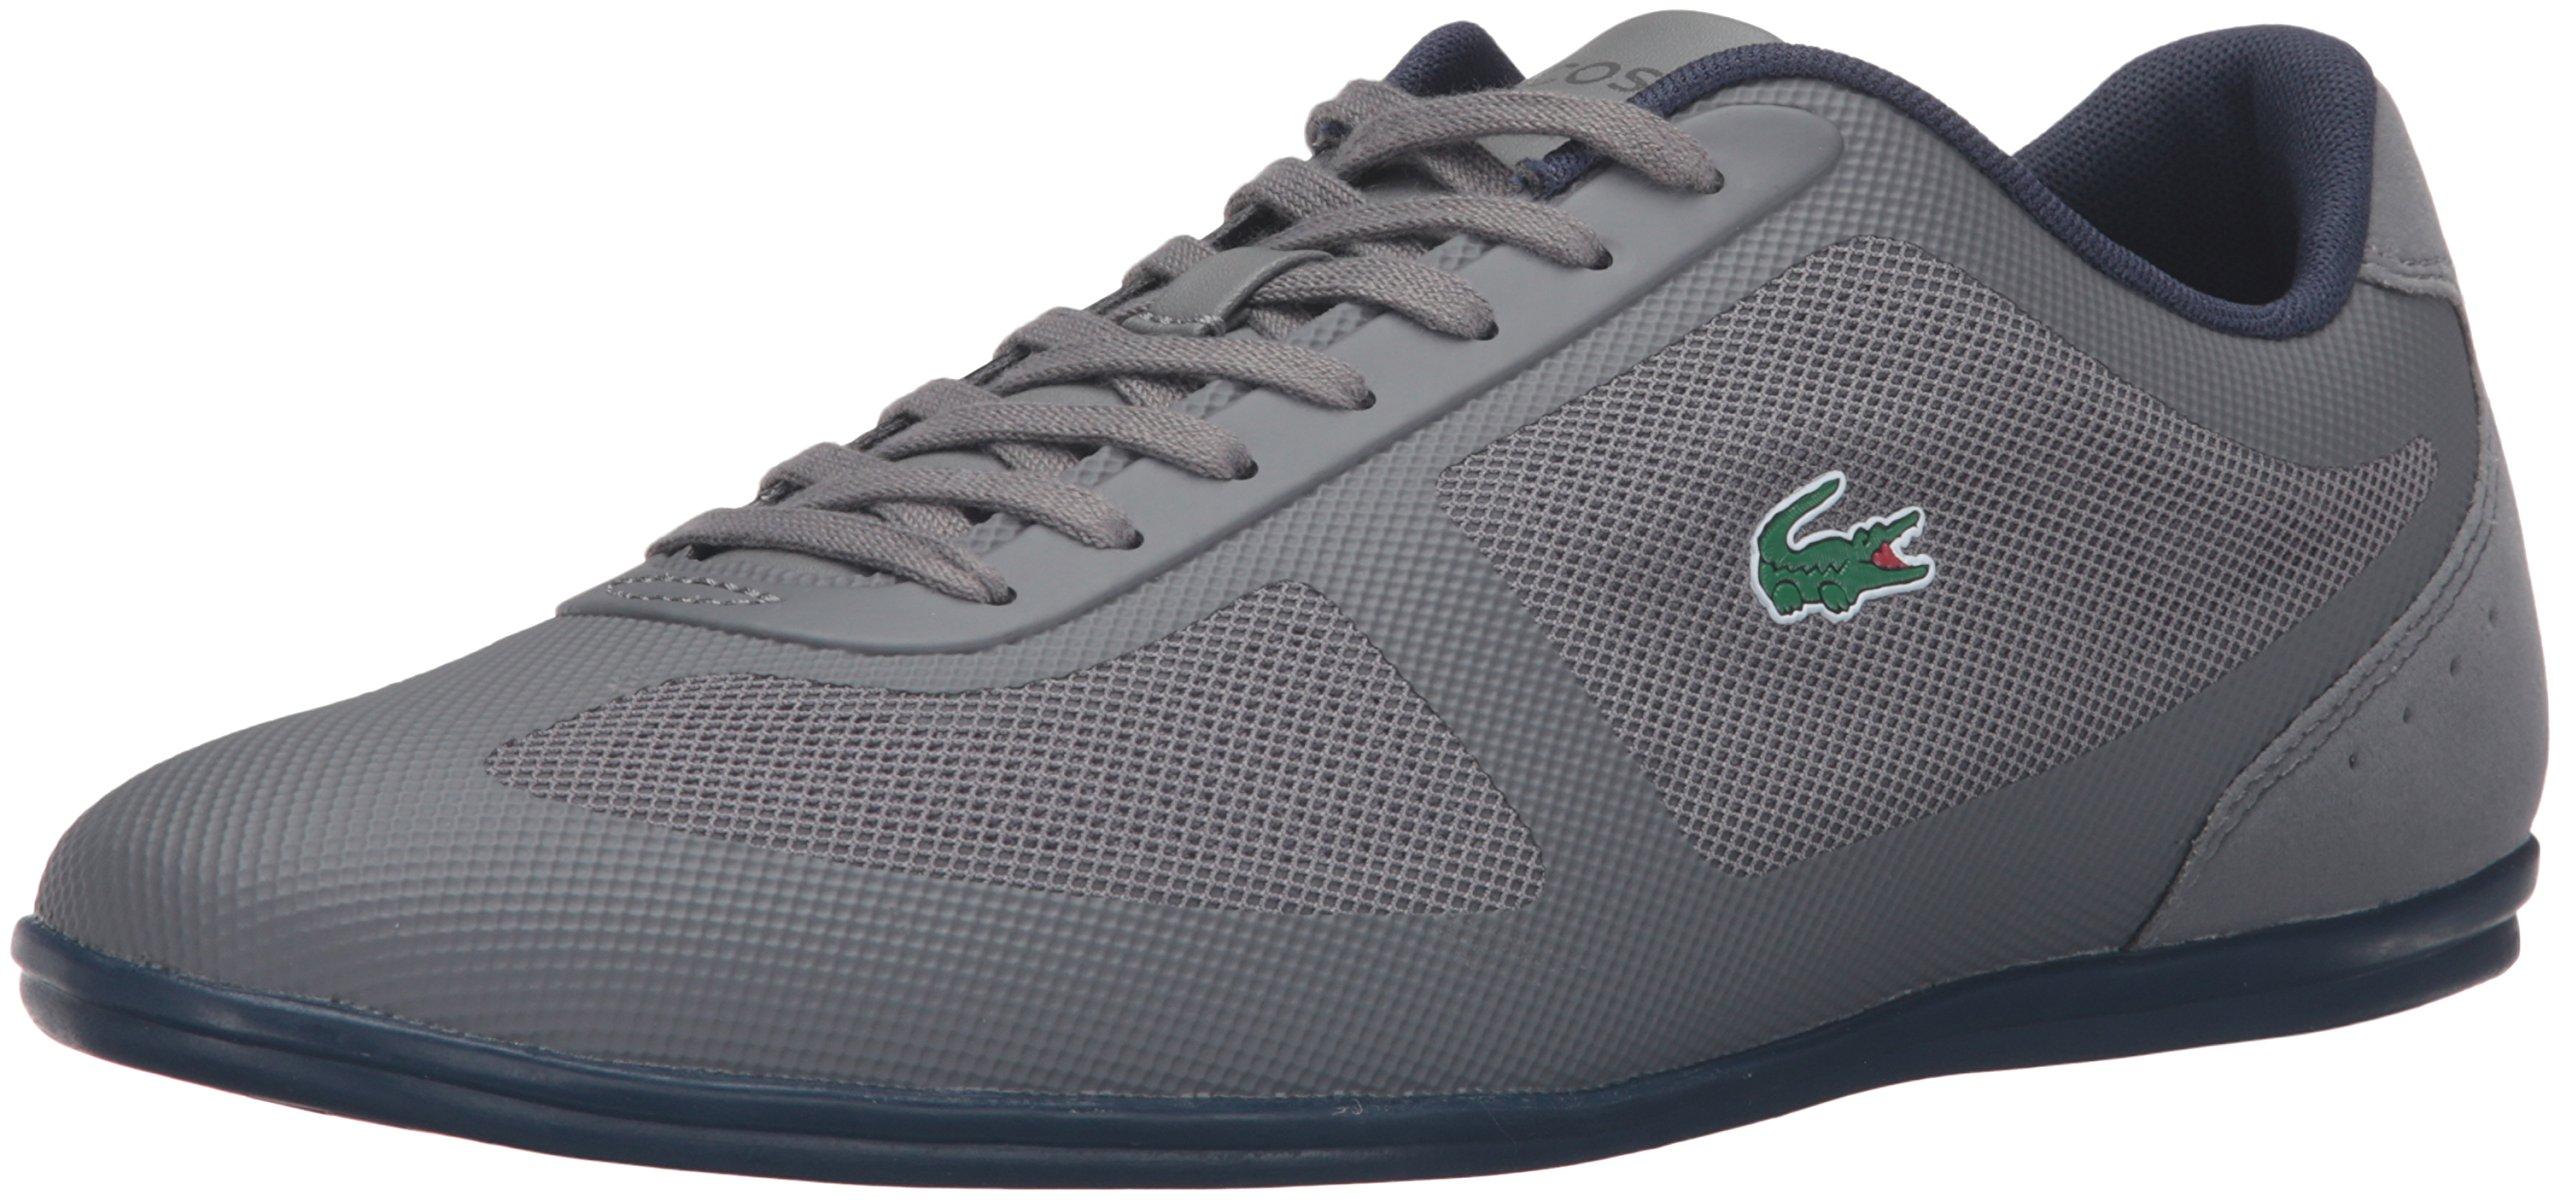 Lacoste Men's Misano Evo 316 1 Spm Fashion Sneaker, Grey, 8 M US